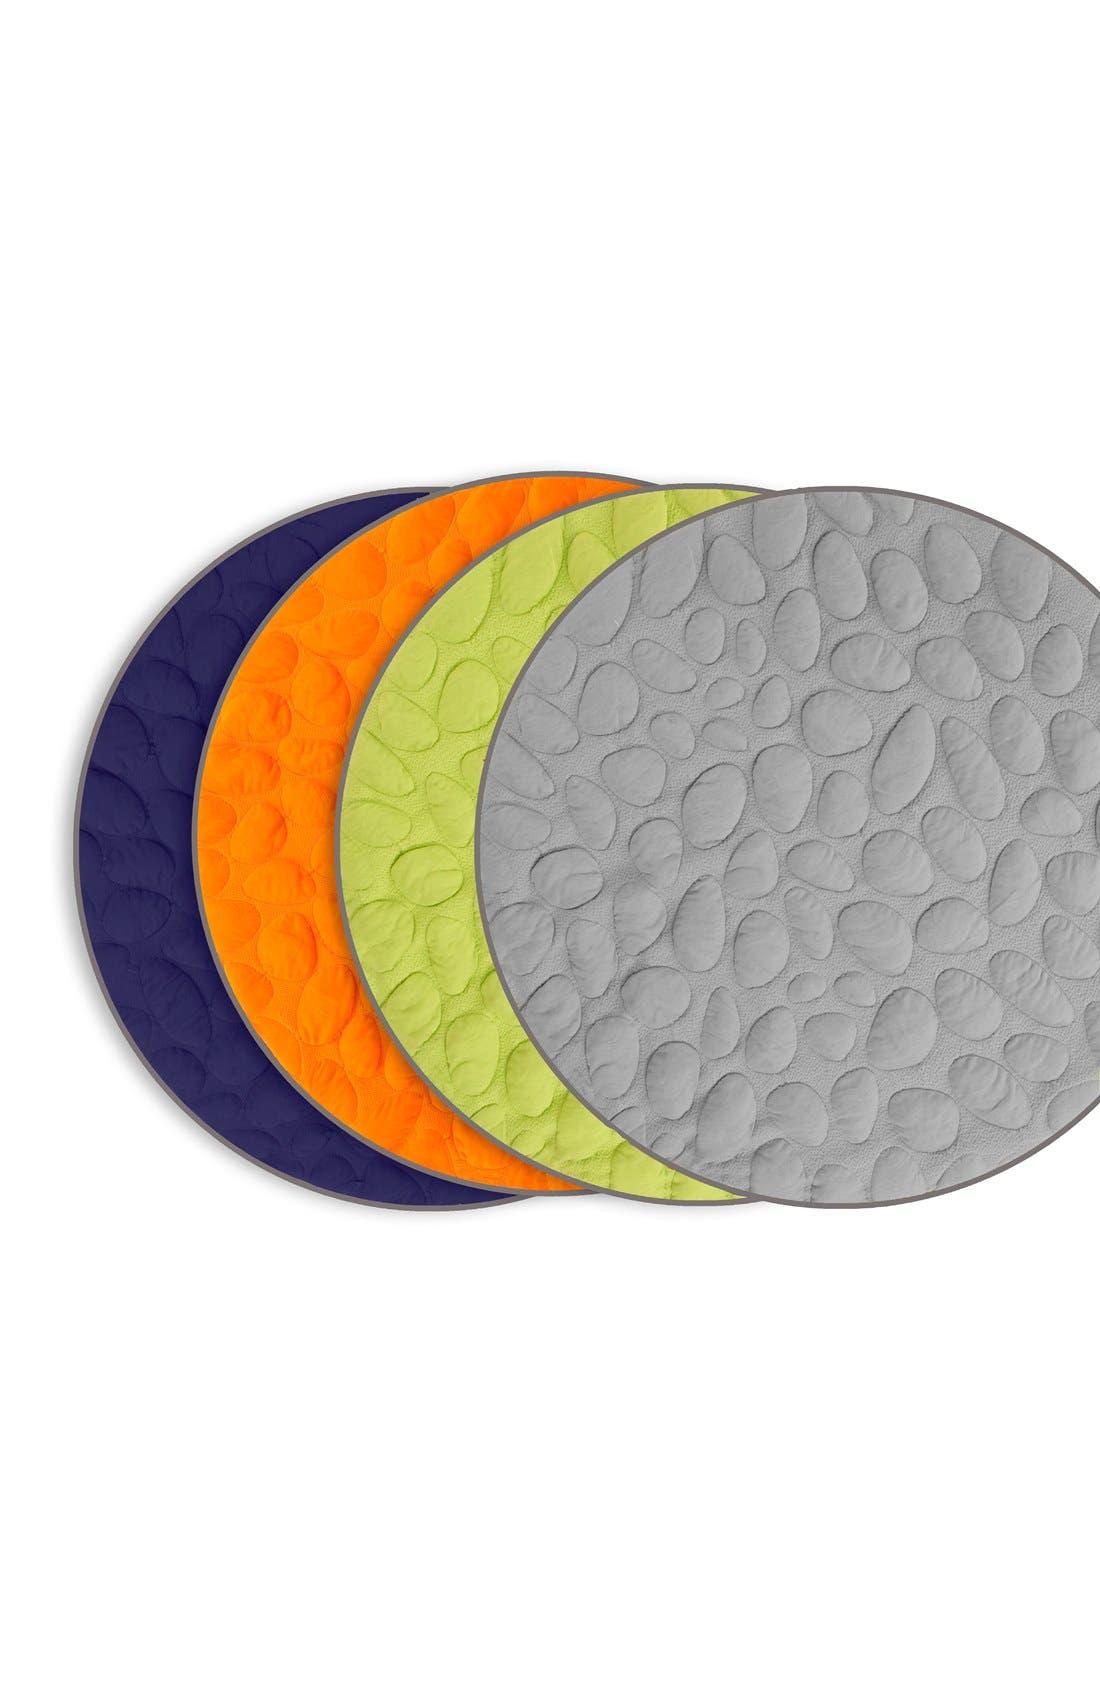 'Pebble LilyPad' Play Mat,                             Alternate thumbnail 2, color,                             Poppy